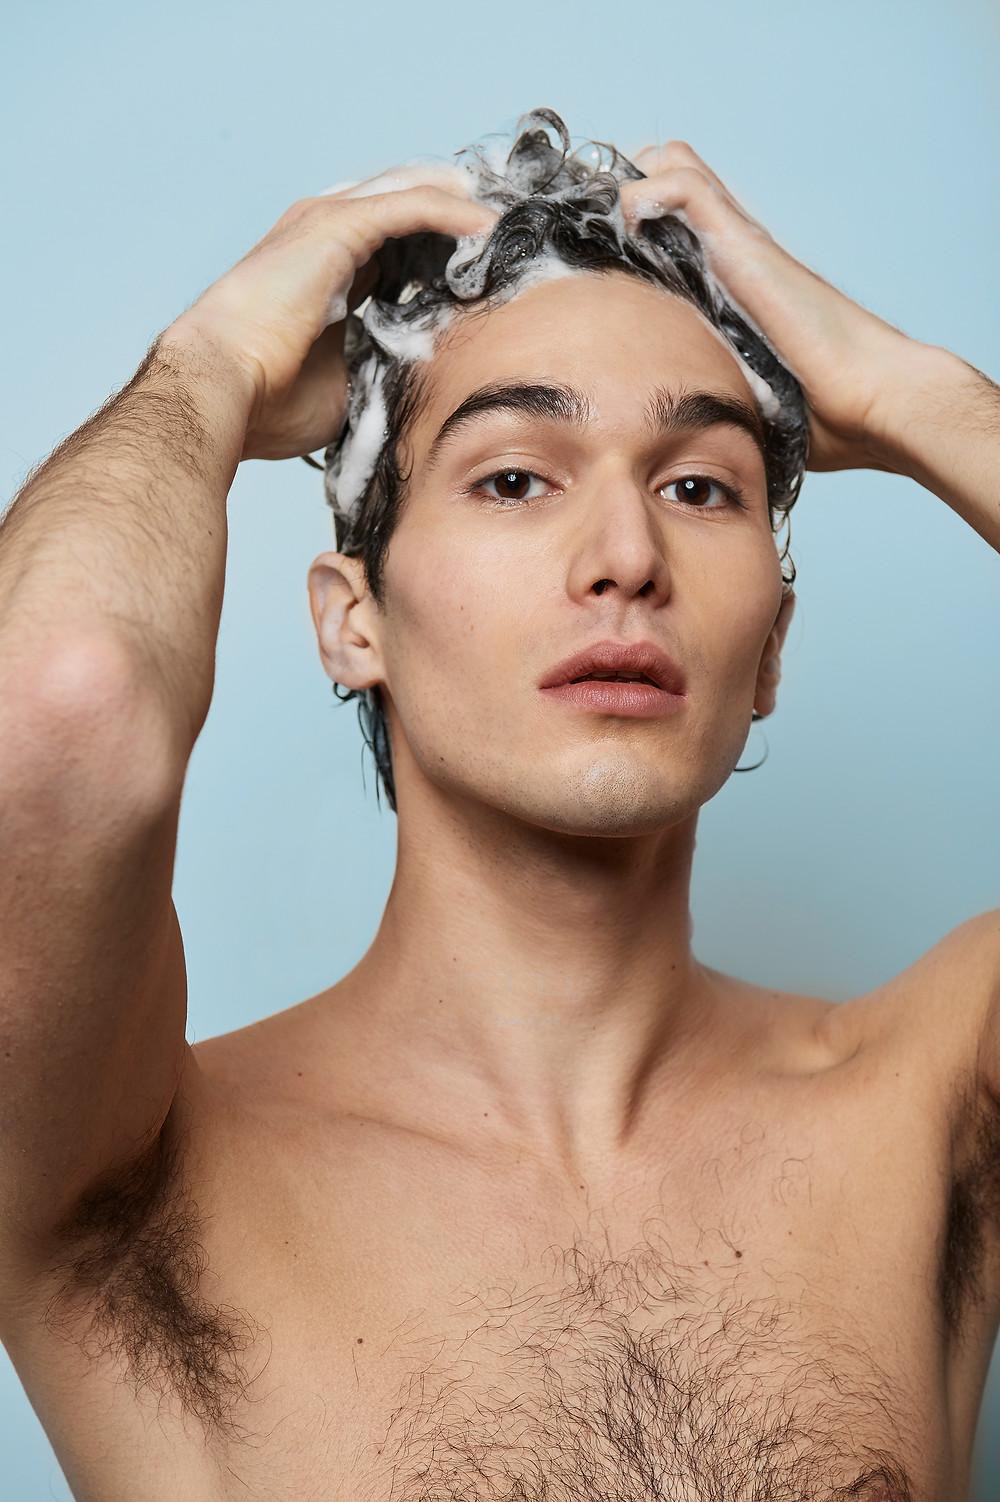 Man shampooing hair in shower